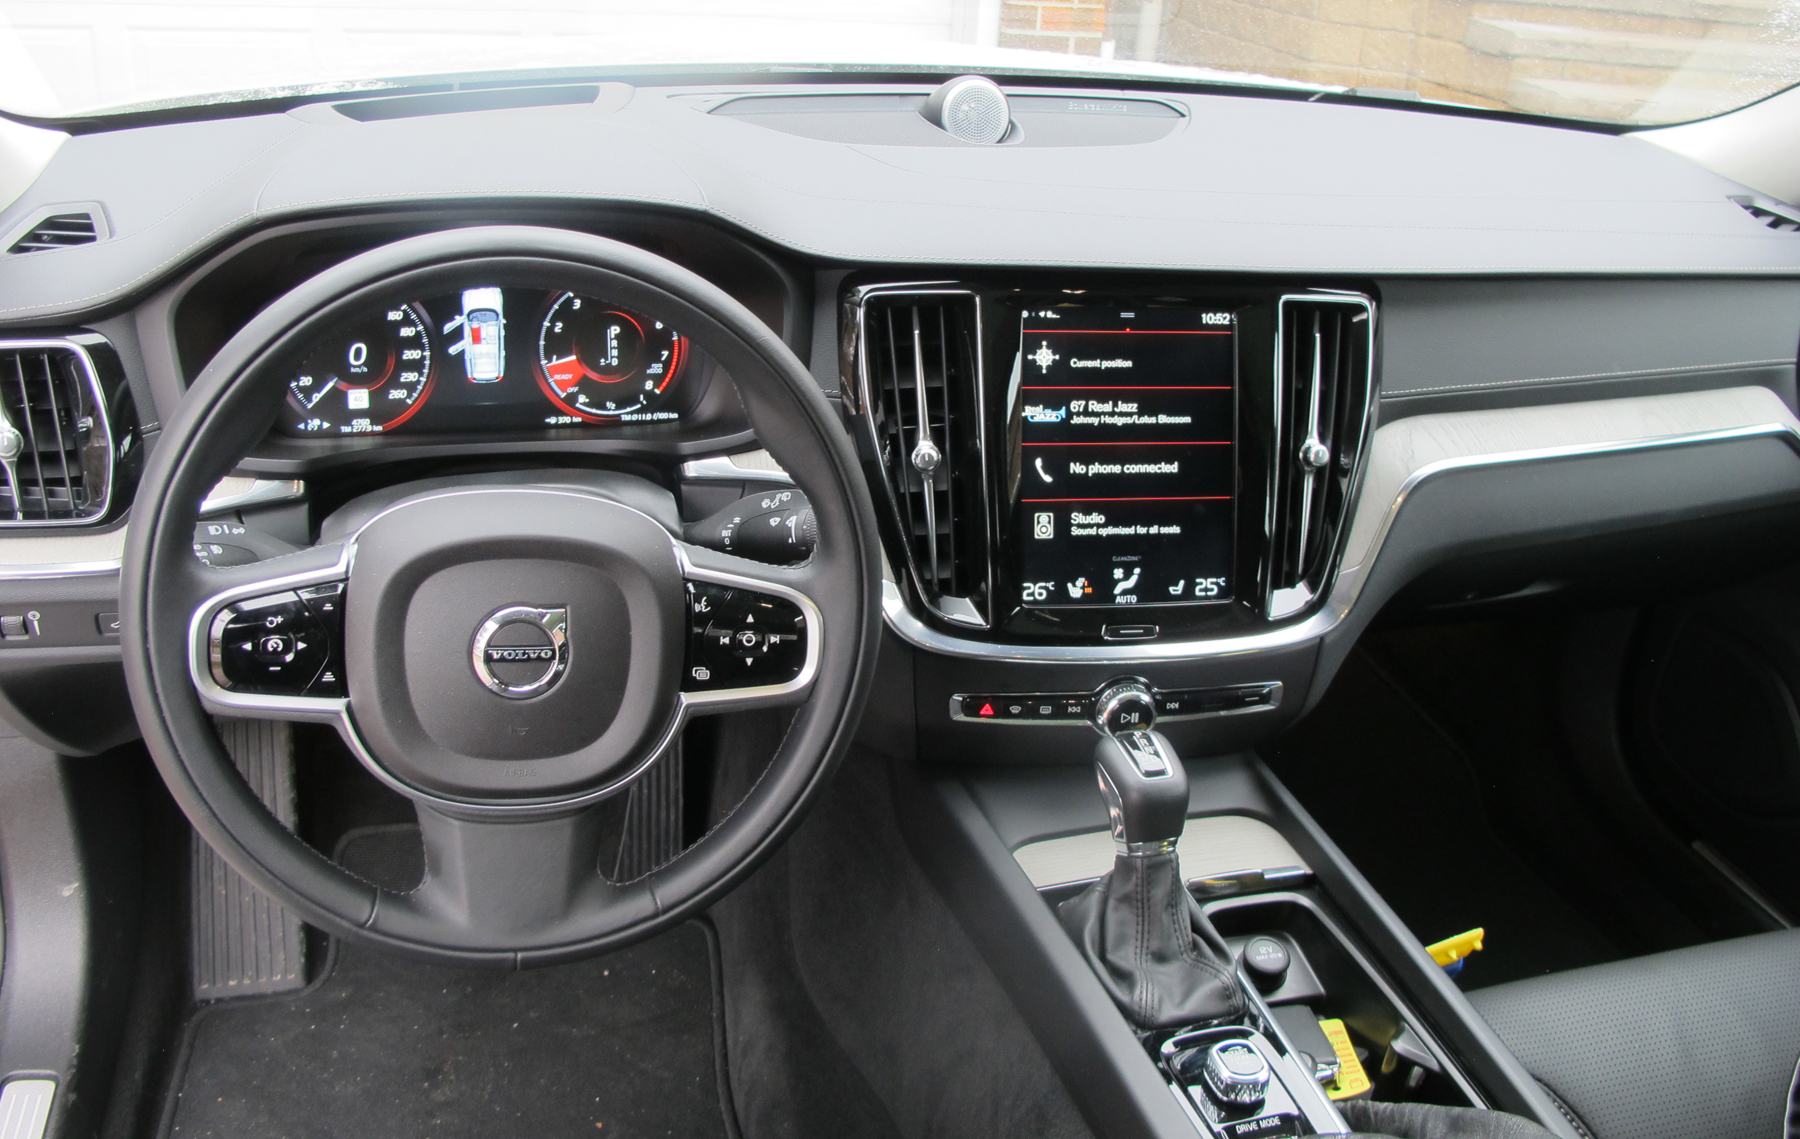 Review 2019 Volvo V60 T6 AWD Inscription